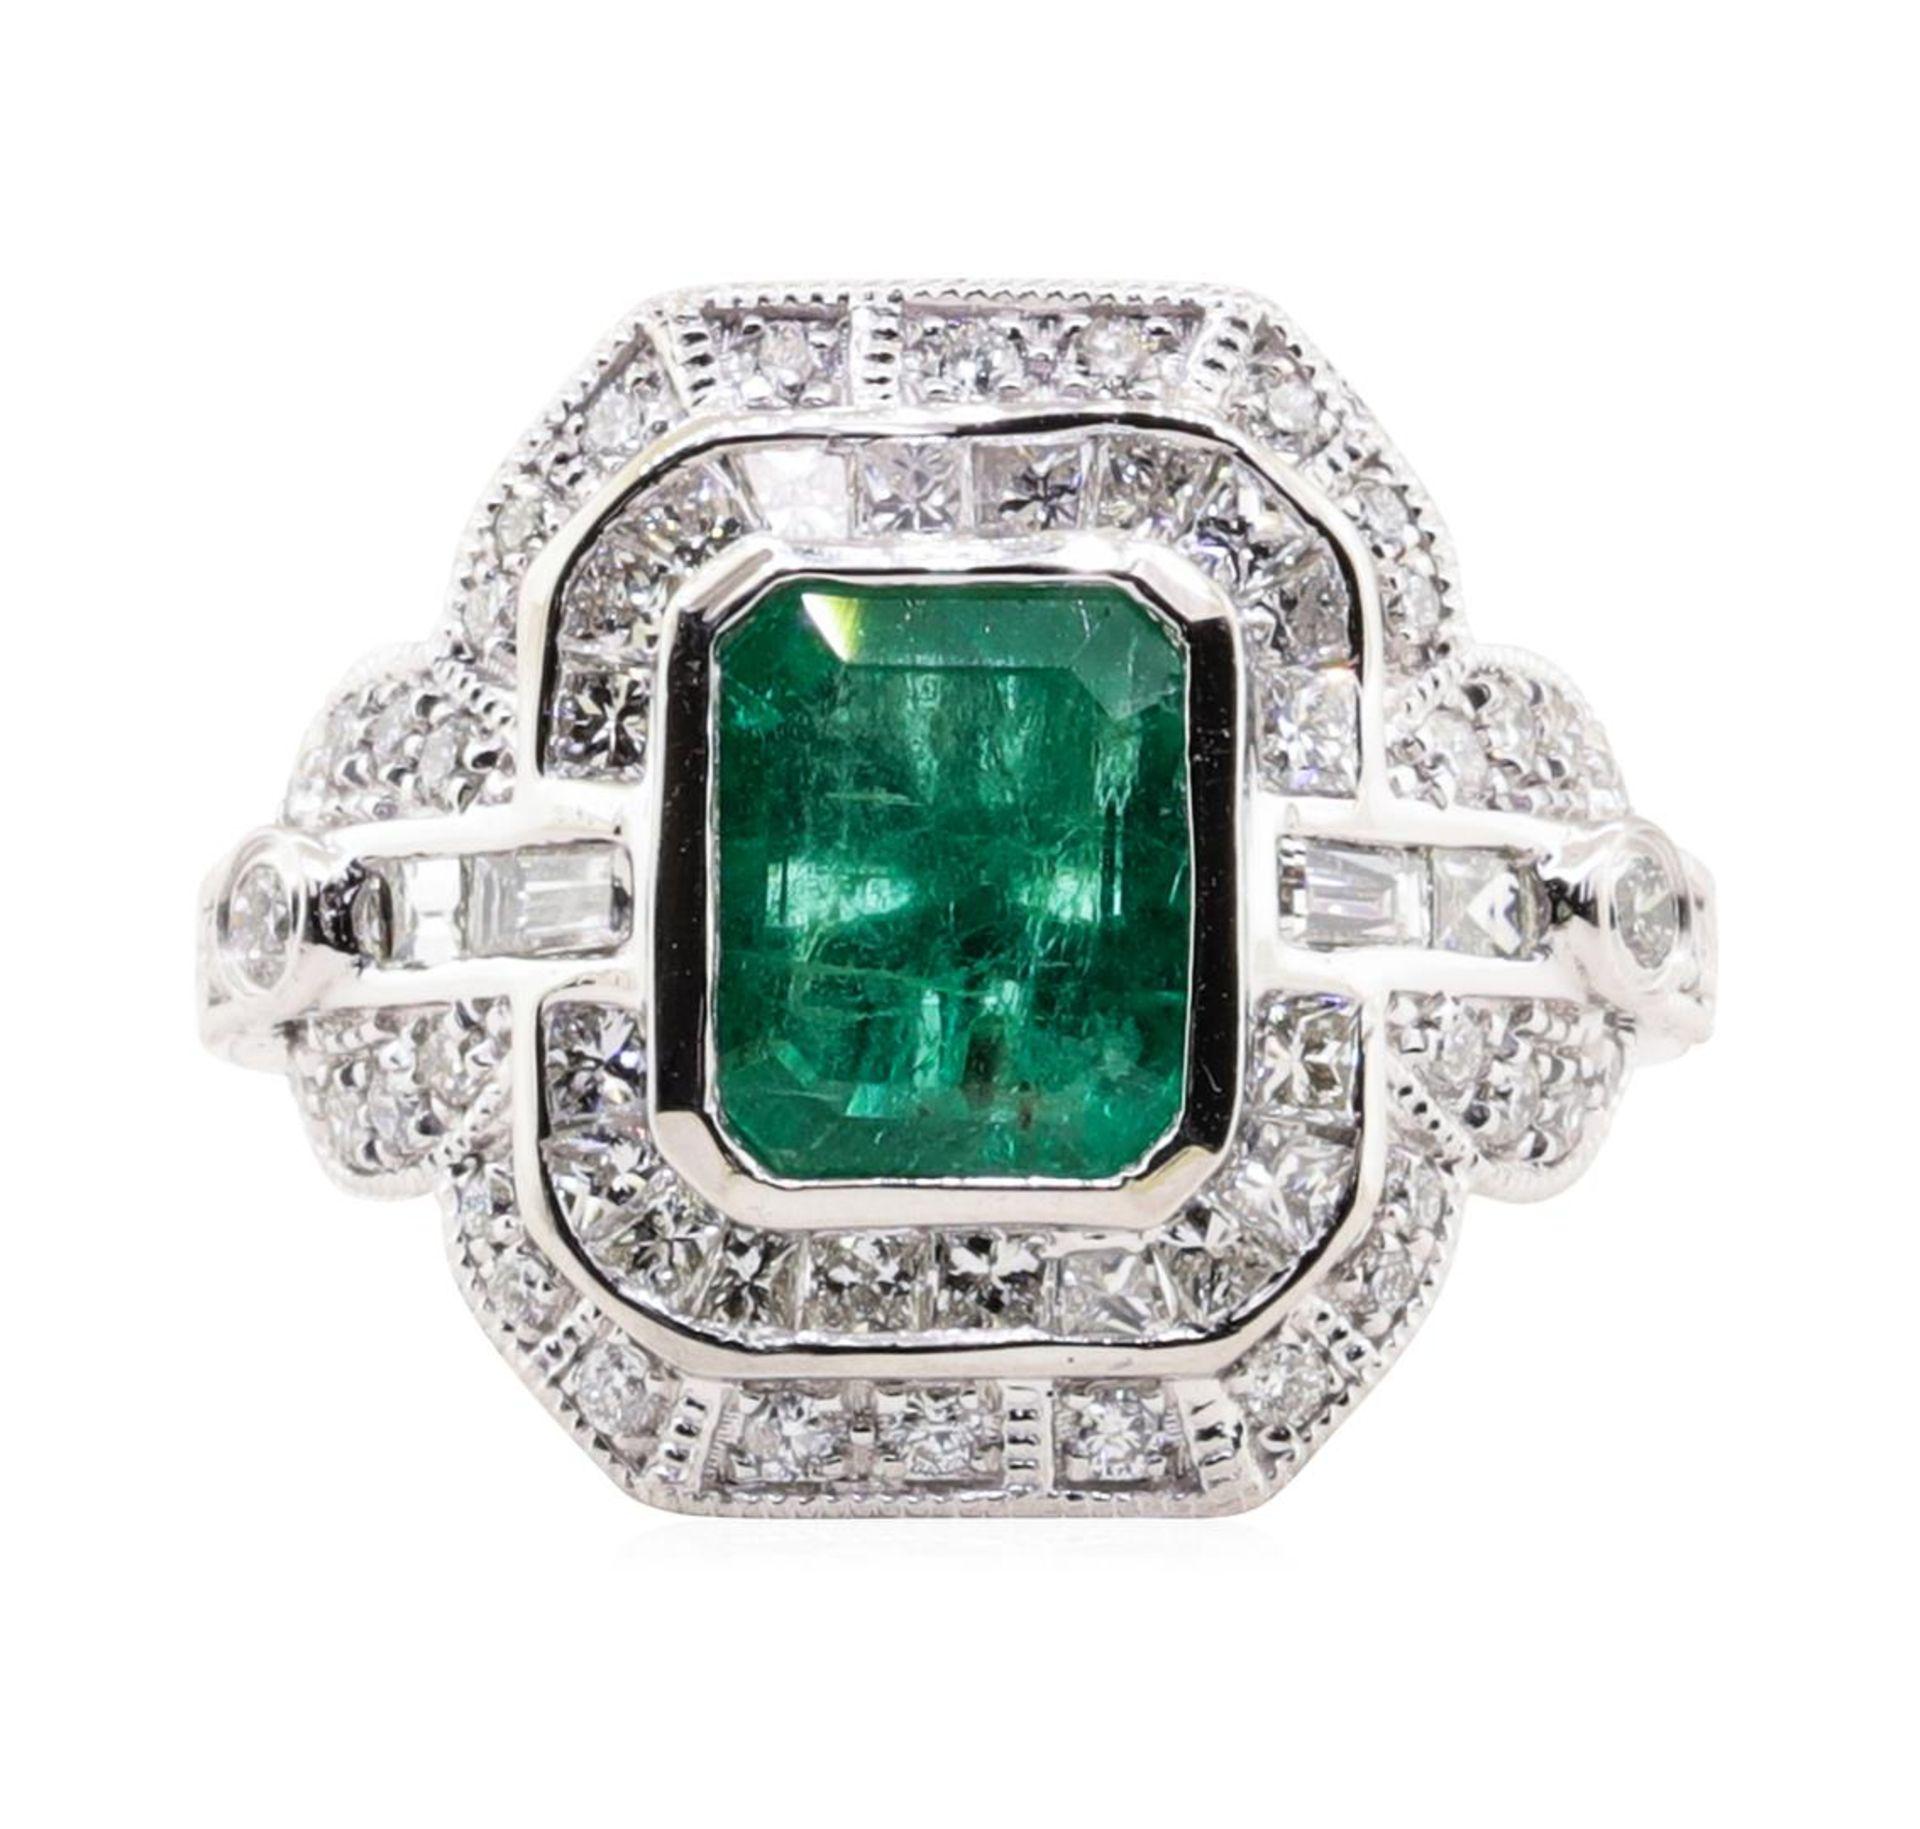 1.94ct Emerald and Diamond Ring - Platinum